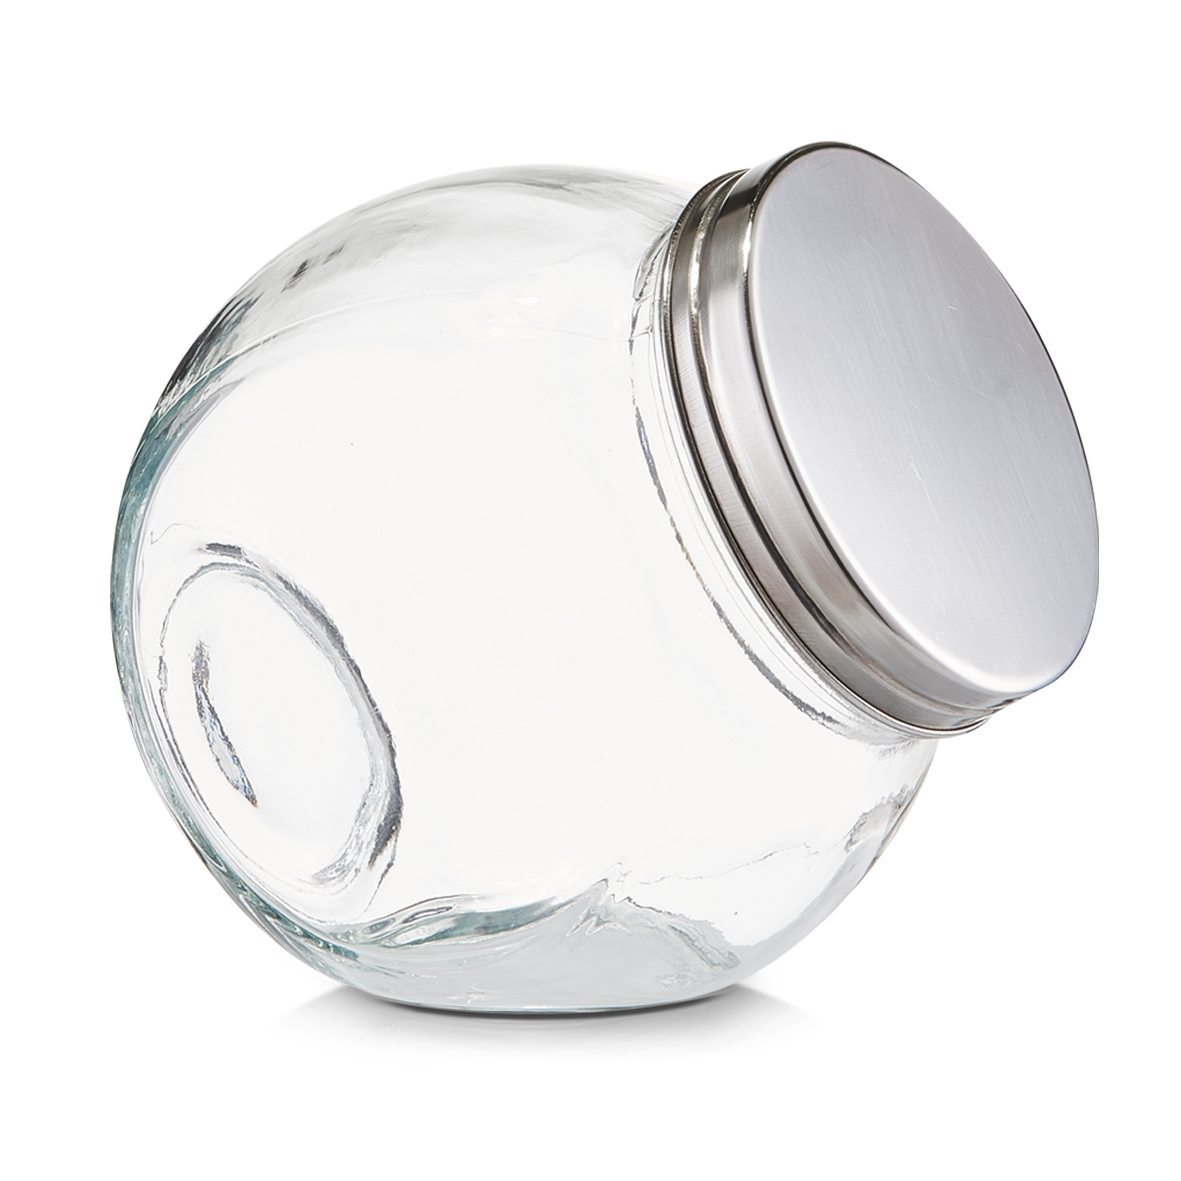 Borcan pentru depozitare din sticla Candy, capac metalic, 450 ml, l12xA8,5xH12,5 cm imagine